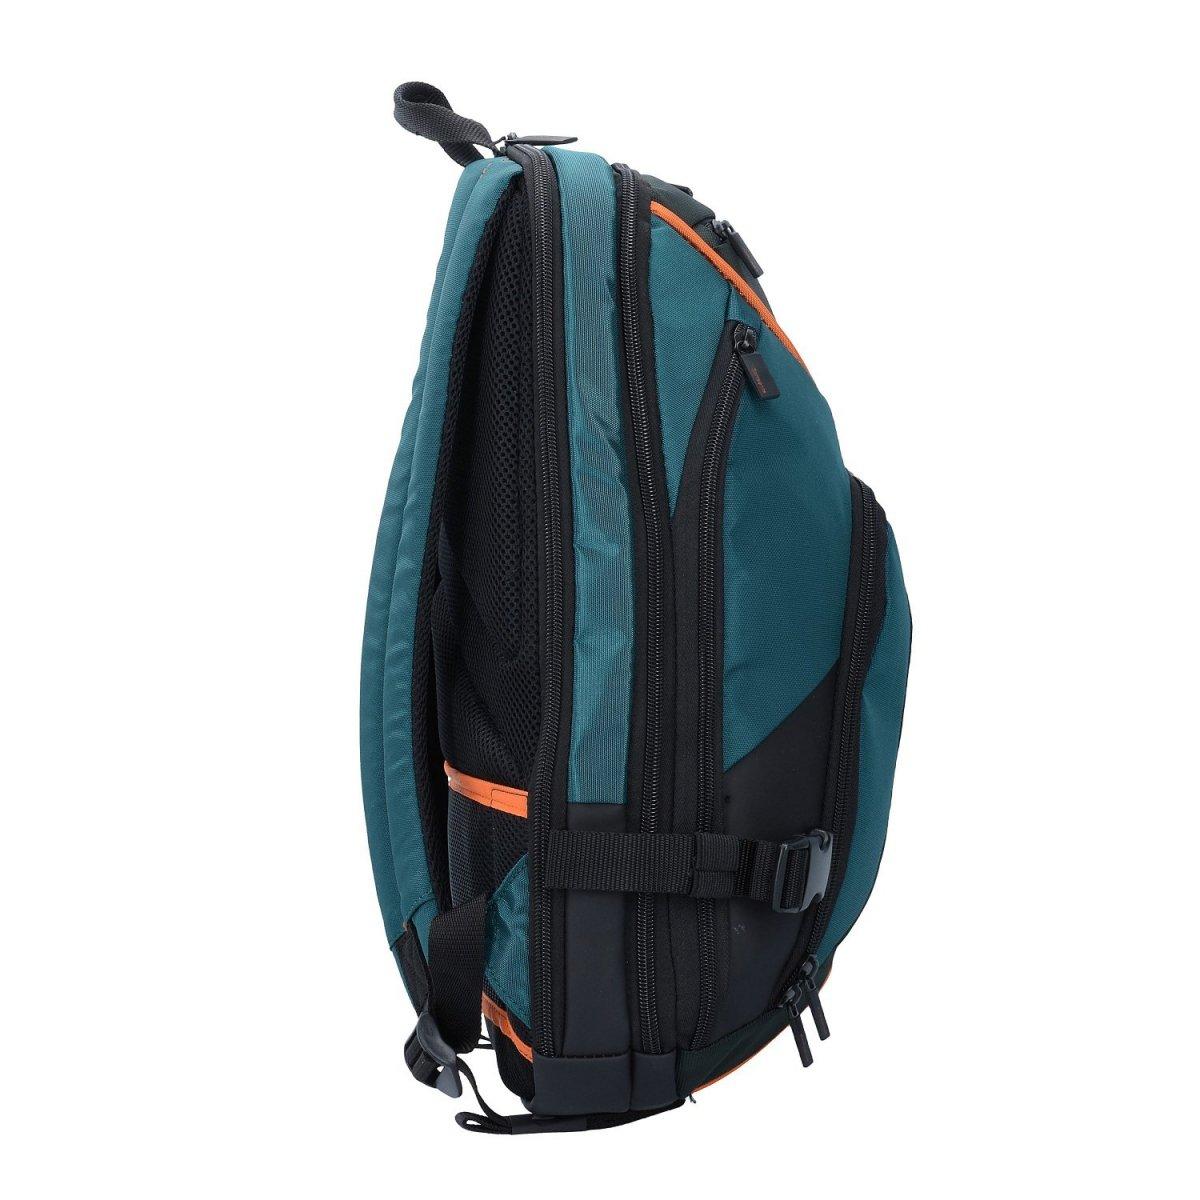 15dd04f3c10ad Plecak na laptopa KLEUR-LAPT. BACKPACK 15.6